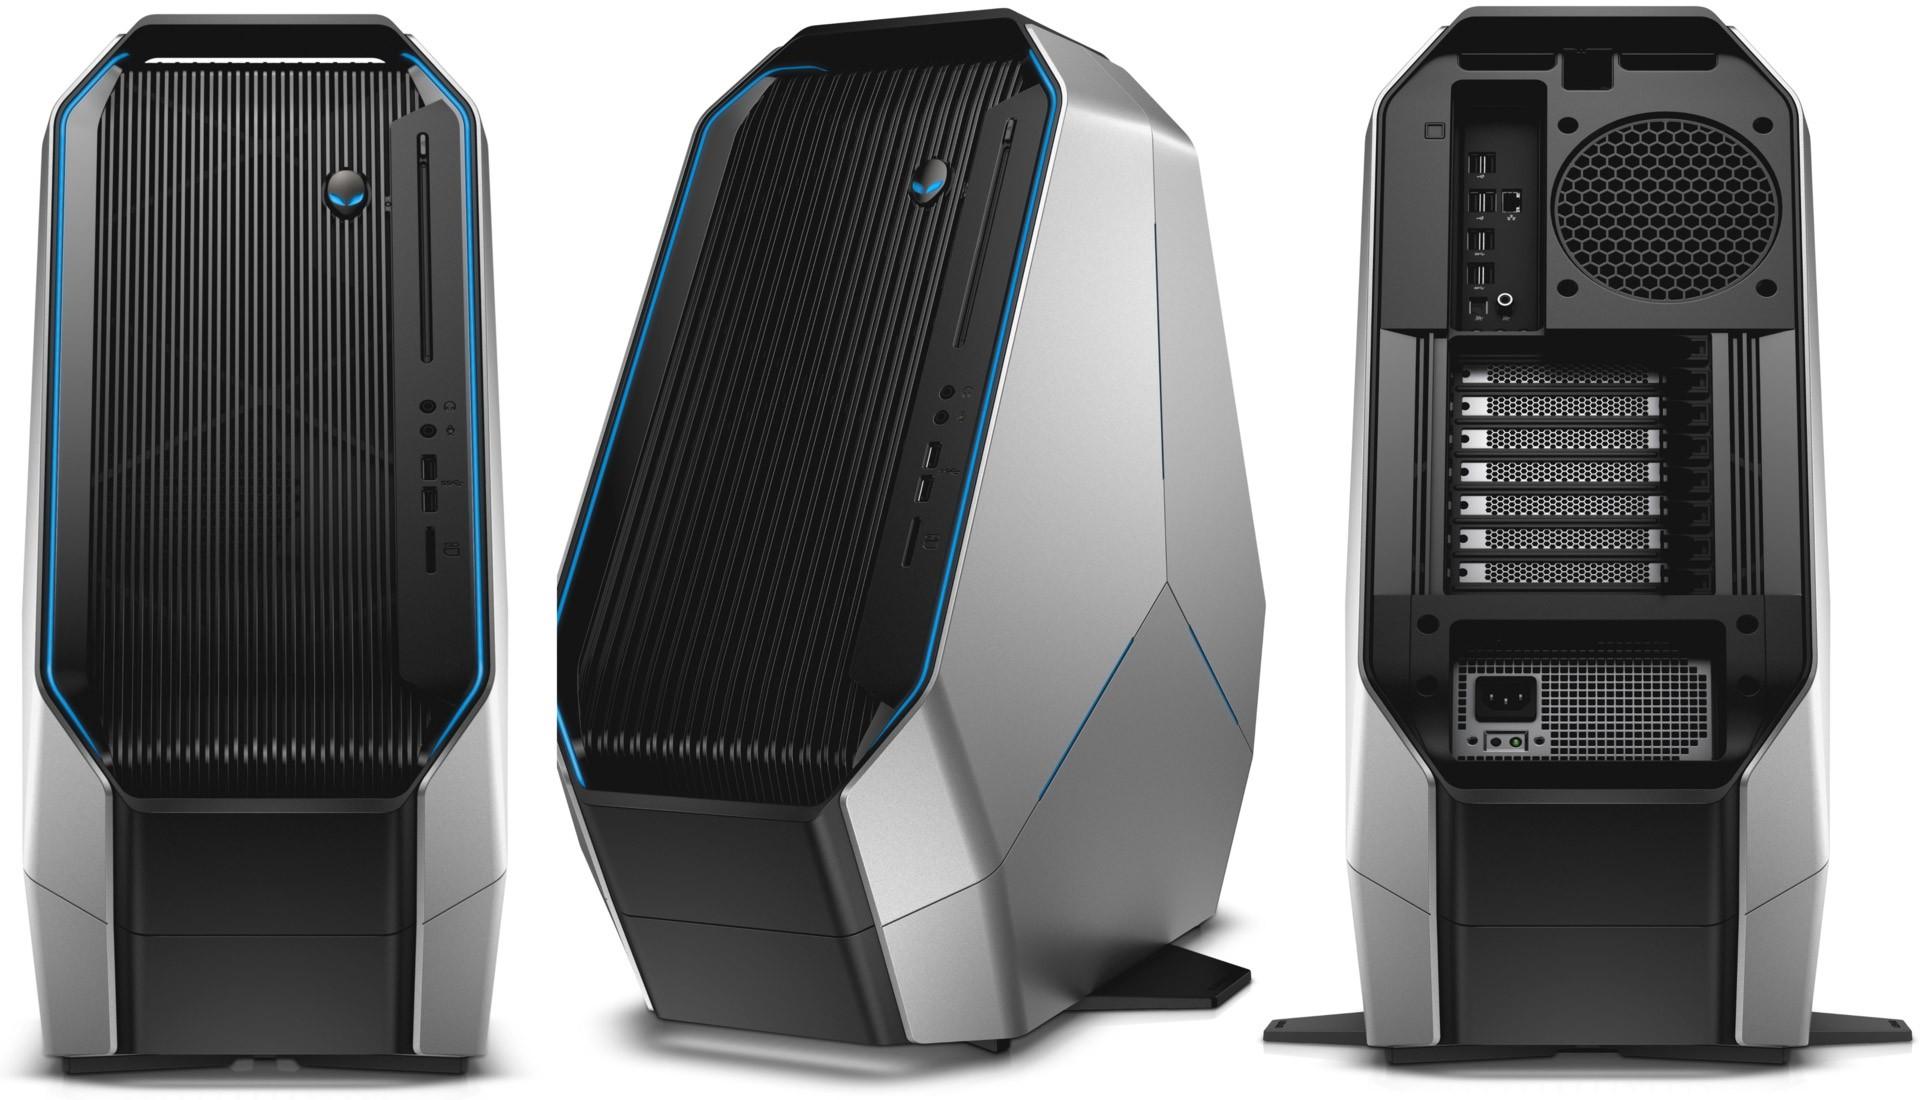 Dell Alienware Area-51 ALX Nvidia GeForce GTS 240 Display 64x